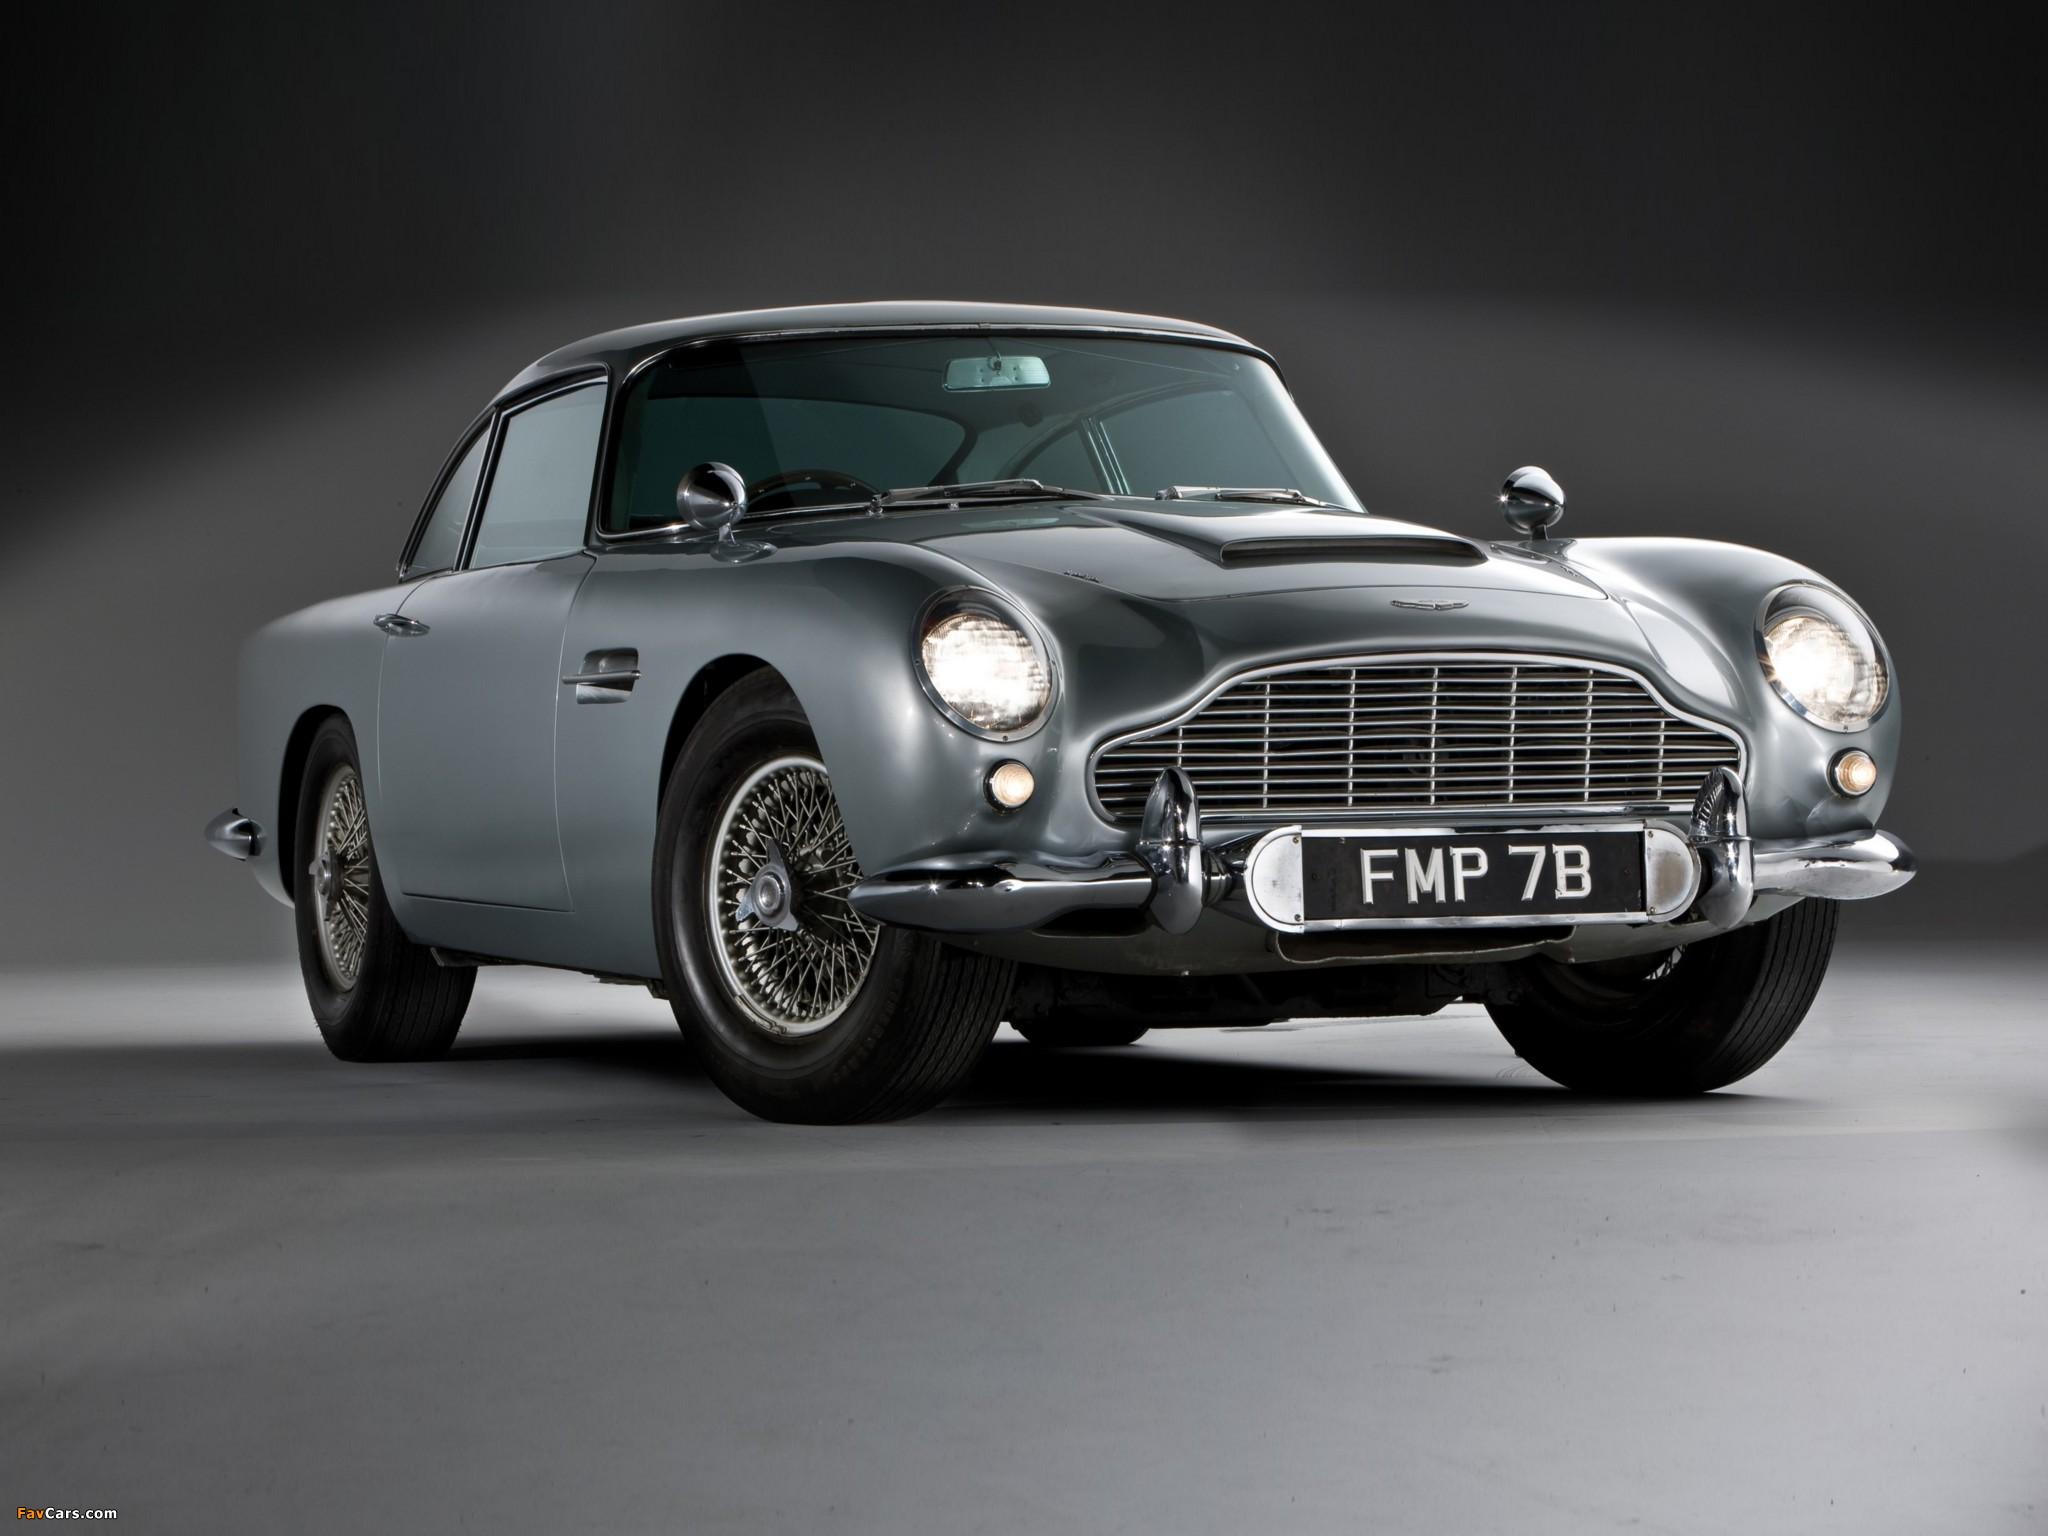 Aston Martin Db5 James Bond Edition 1964 Wallpapers